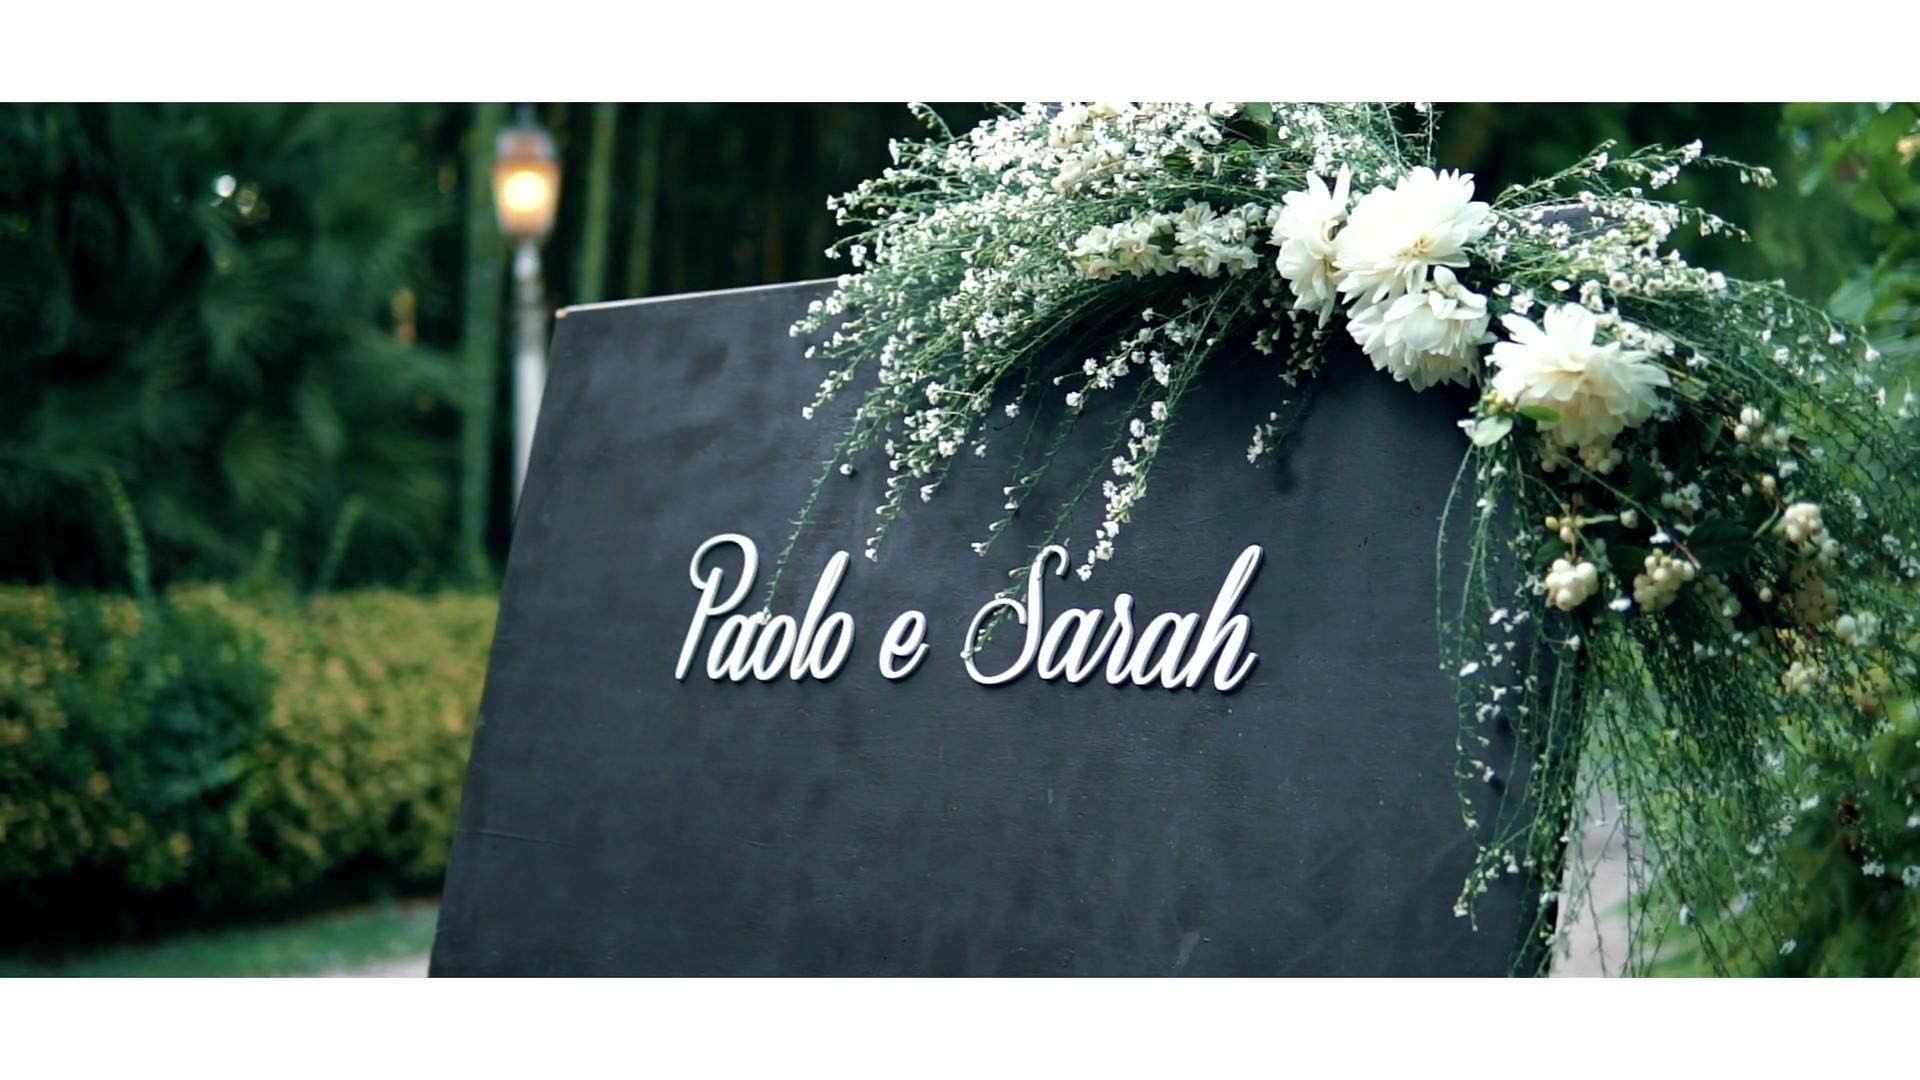 Paolo e Sarah_Moment